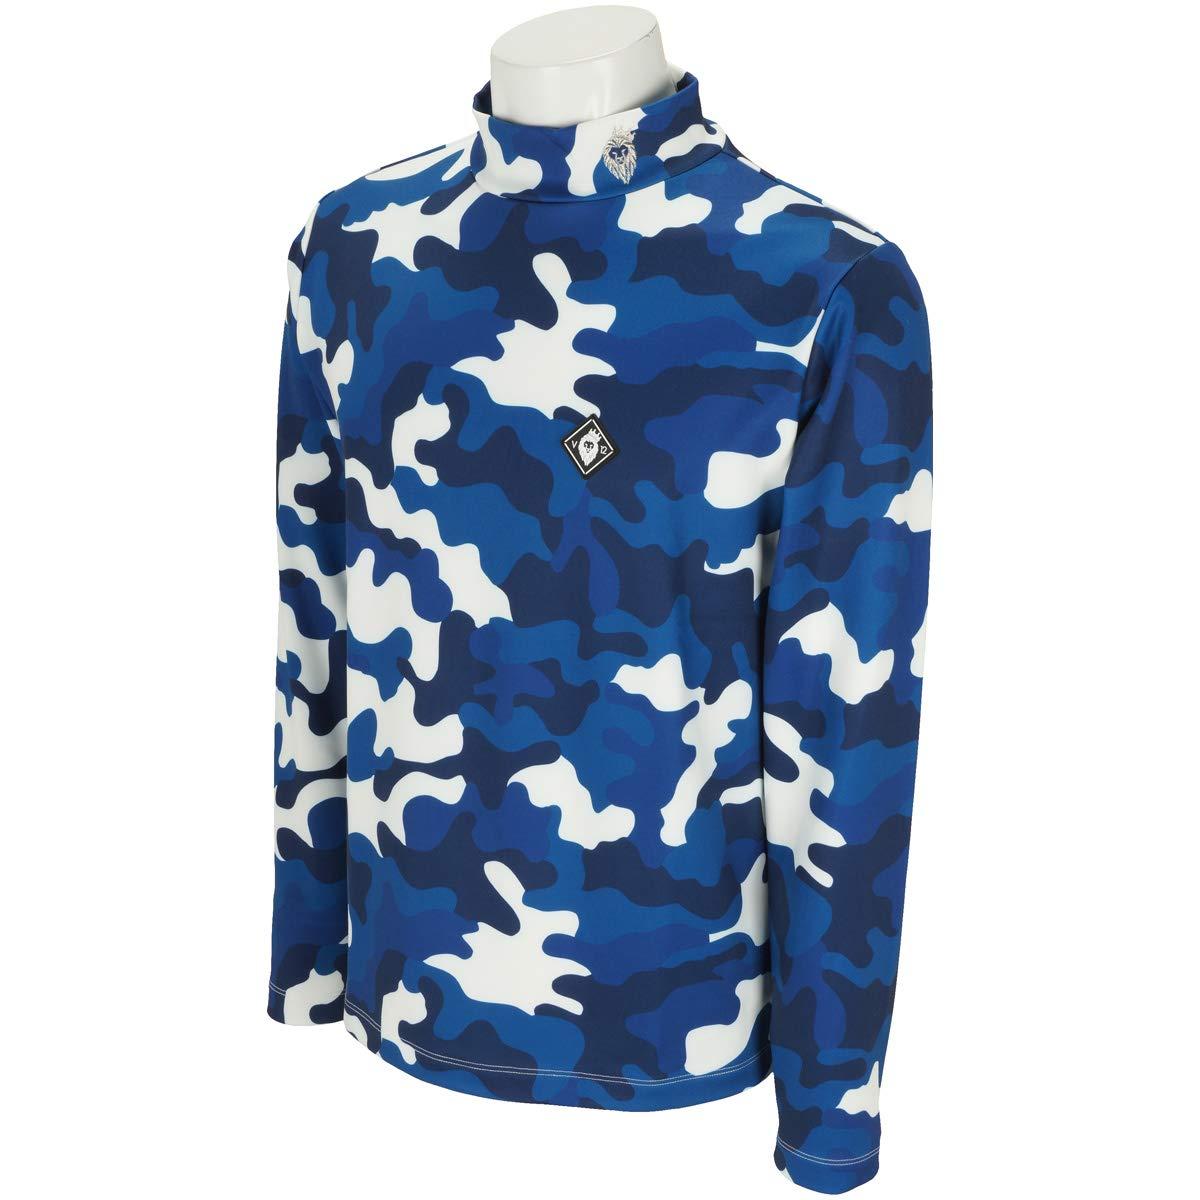 V12 ゴルフ ヴィトゥエルブ メンズ ハイネックシャツ 長袖 モックネックシャツ CAMO MOCK 裏微起毛   B07HMMKRN4